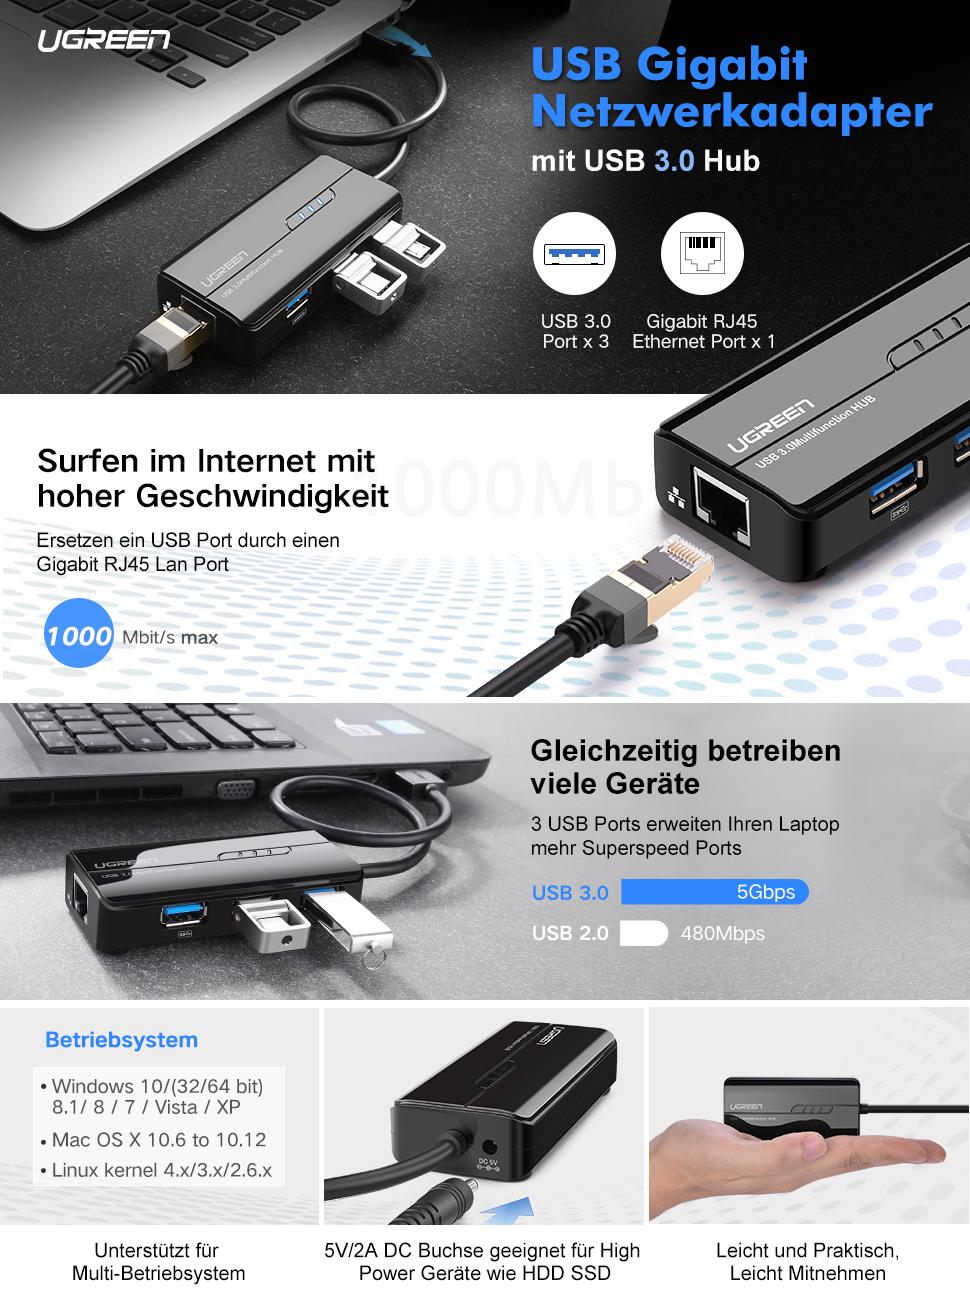 UGREEN USB 3.0 Hub 3 Port mit Gigabit Netzwerkadapter: Amazon.de ...